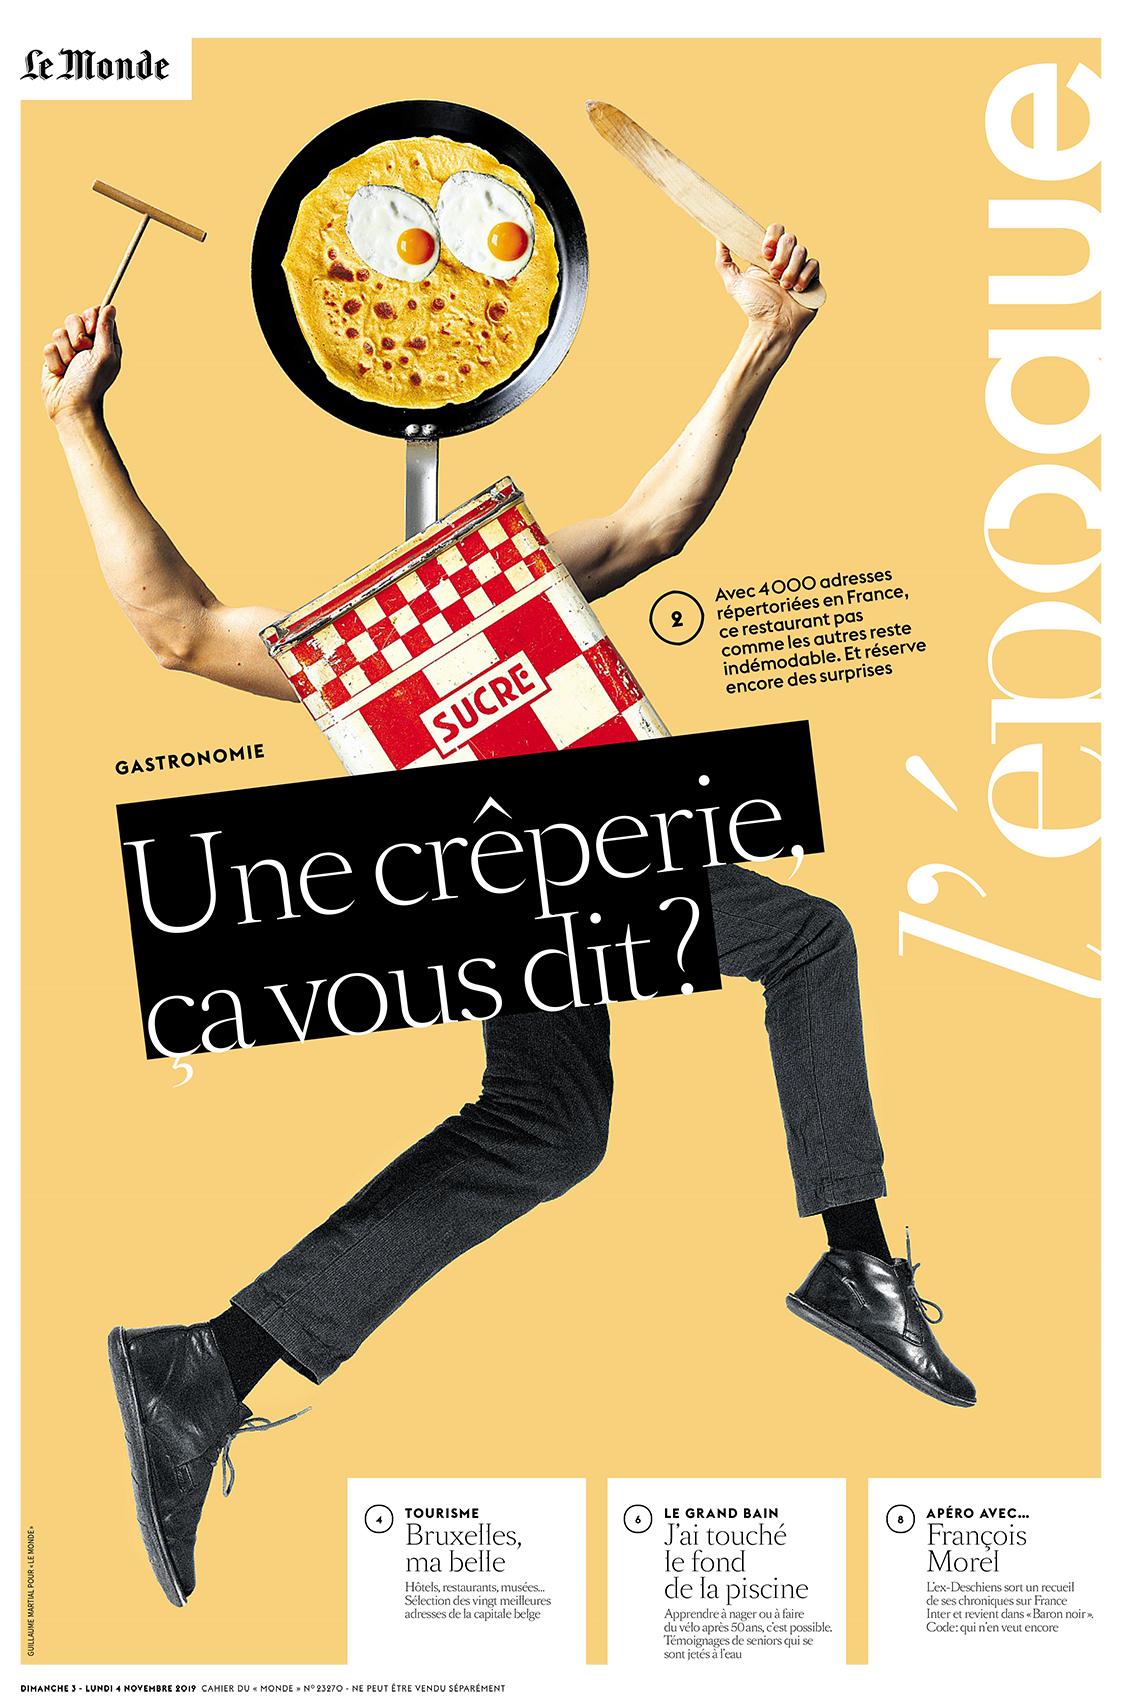 Le Monde Crepe news